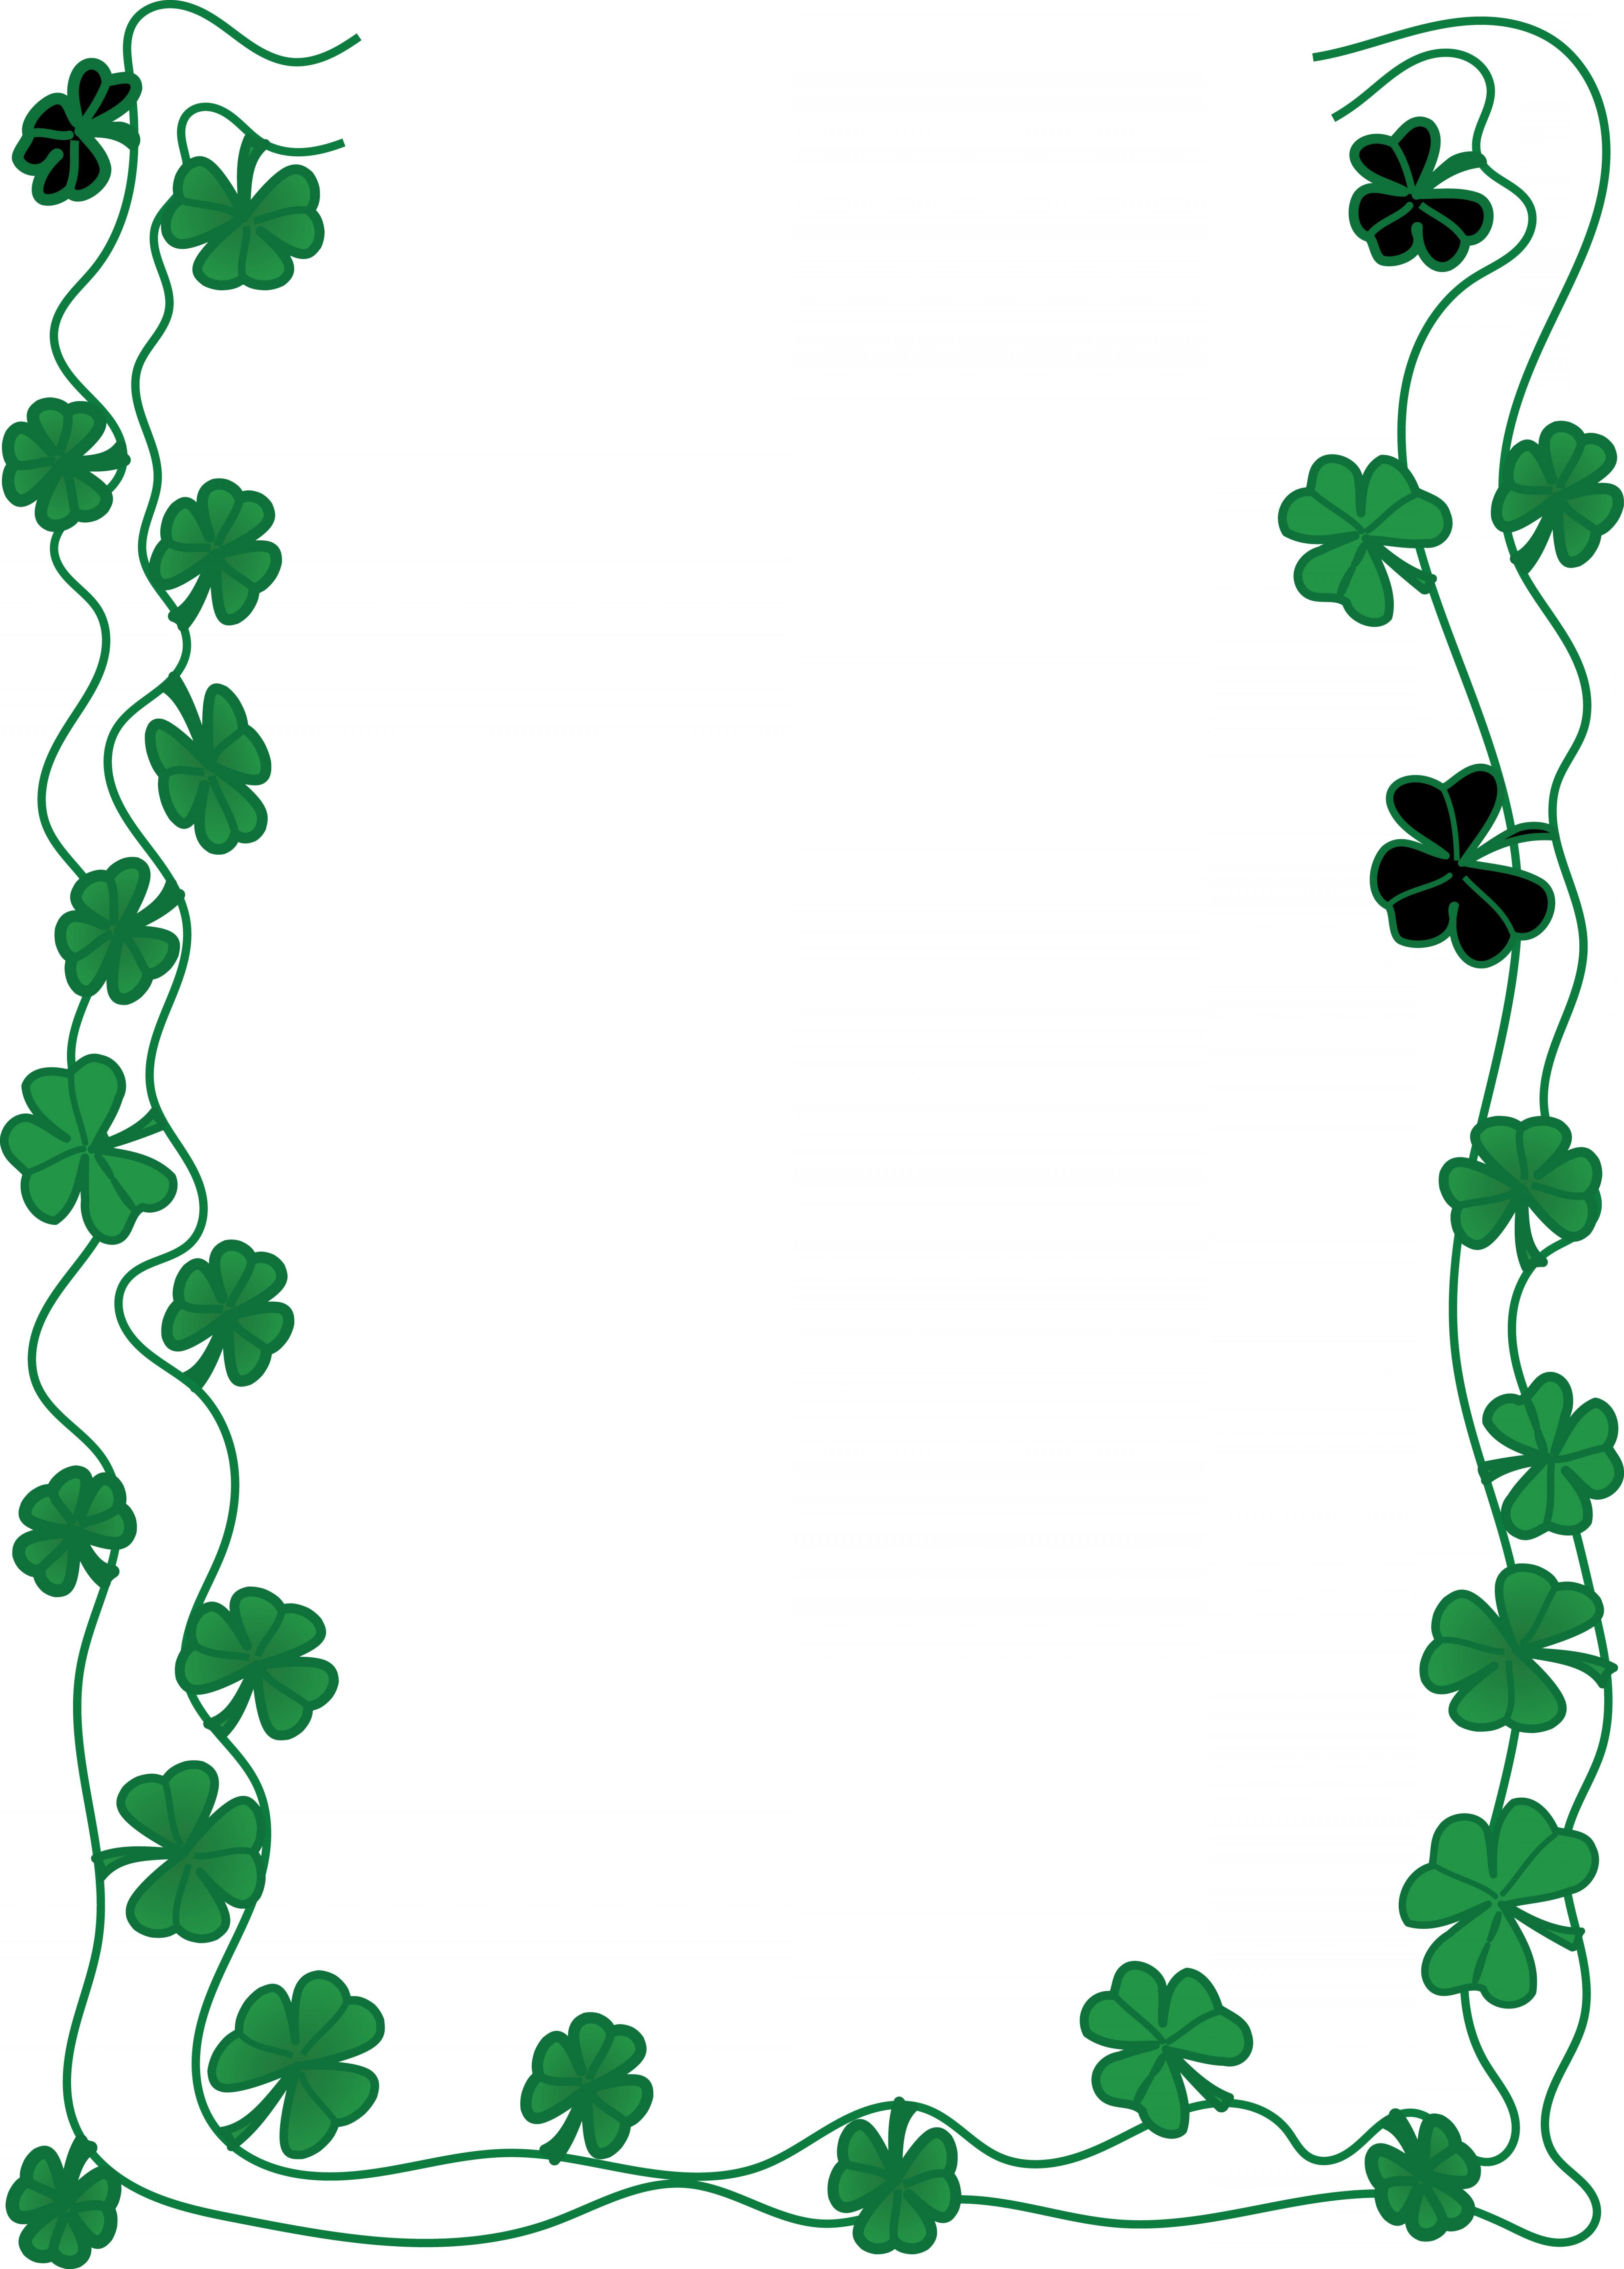 Free Clipart Of A St Patricks Day Shamrock Clover Border.